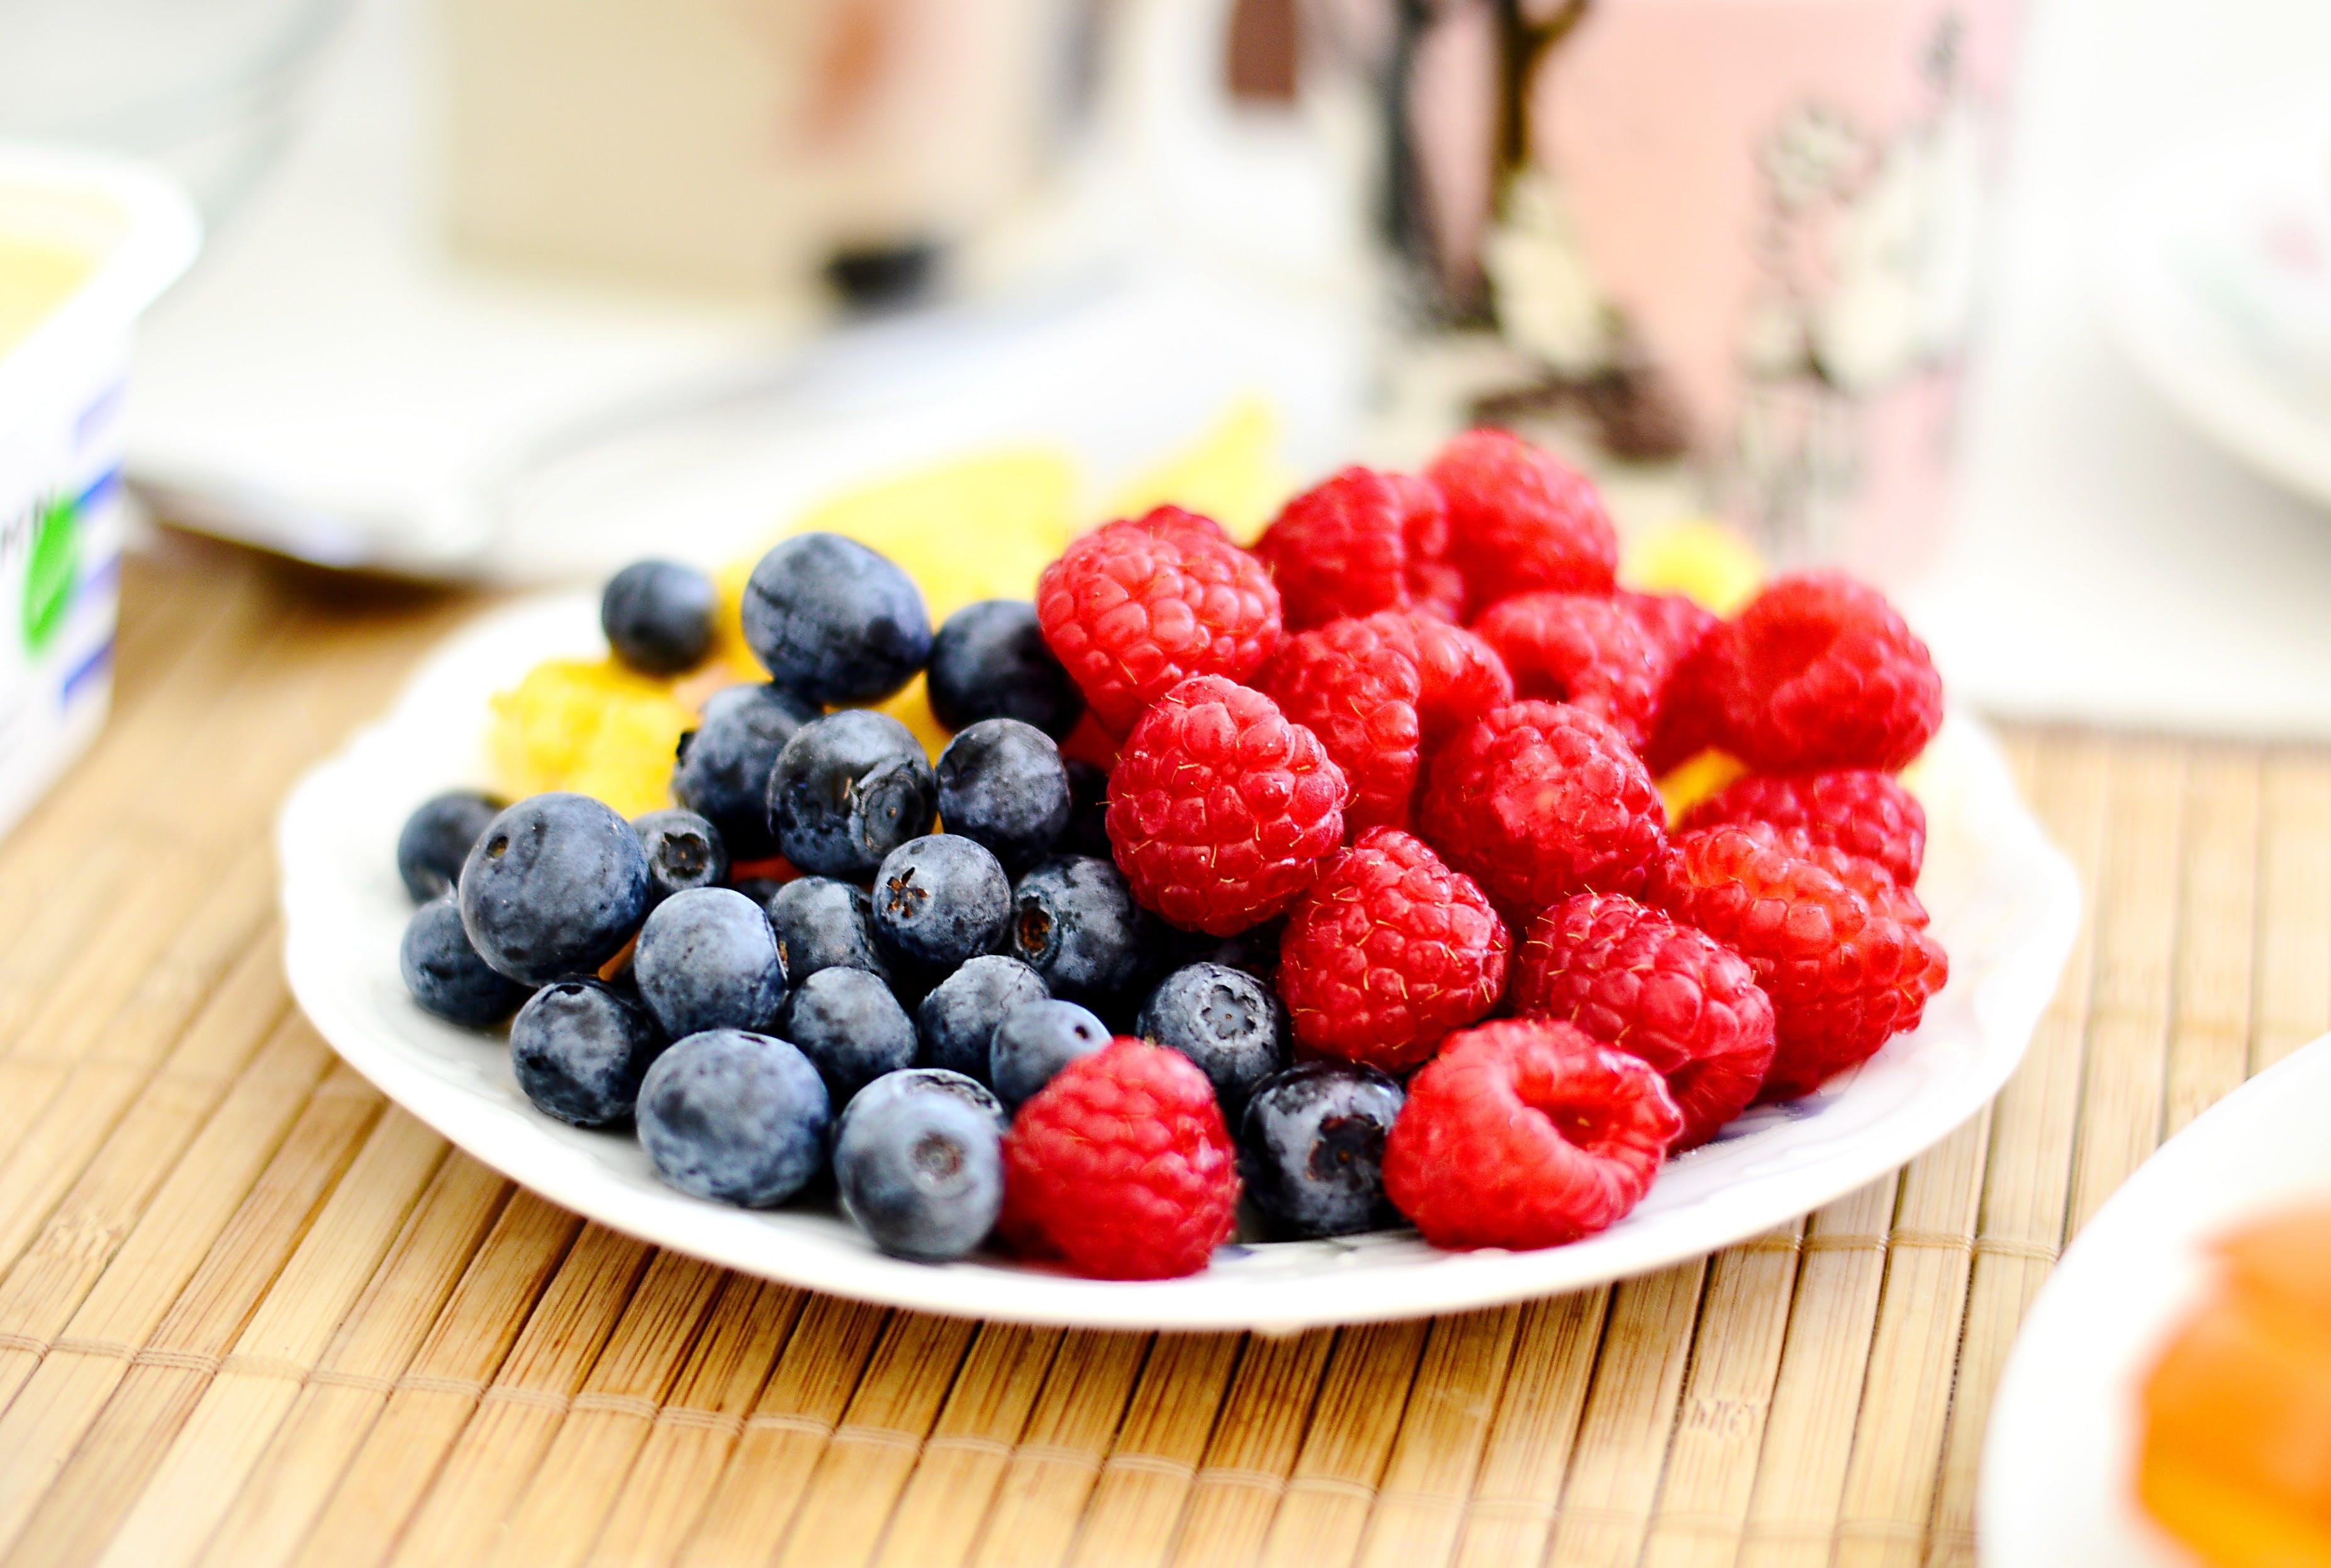 blueberries and raspberries